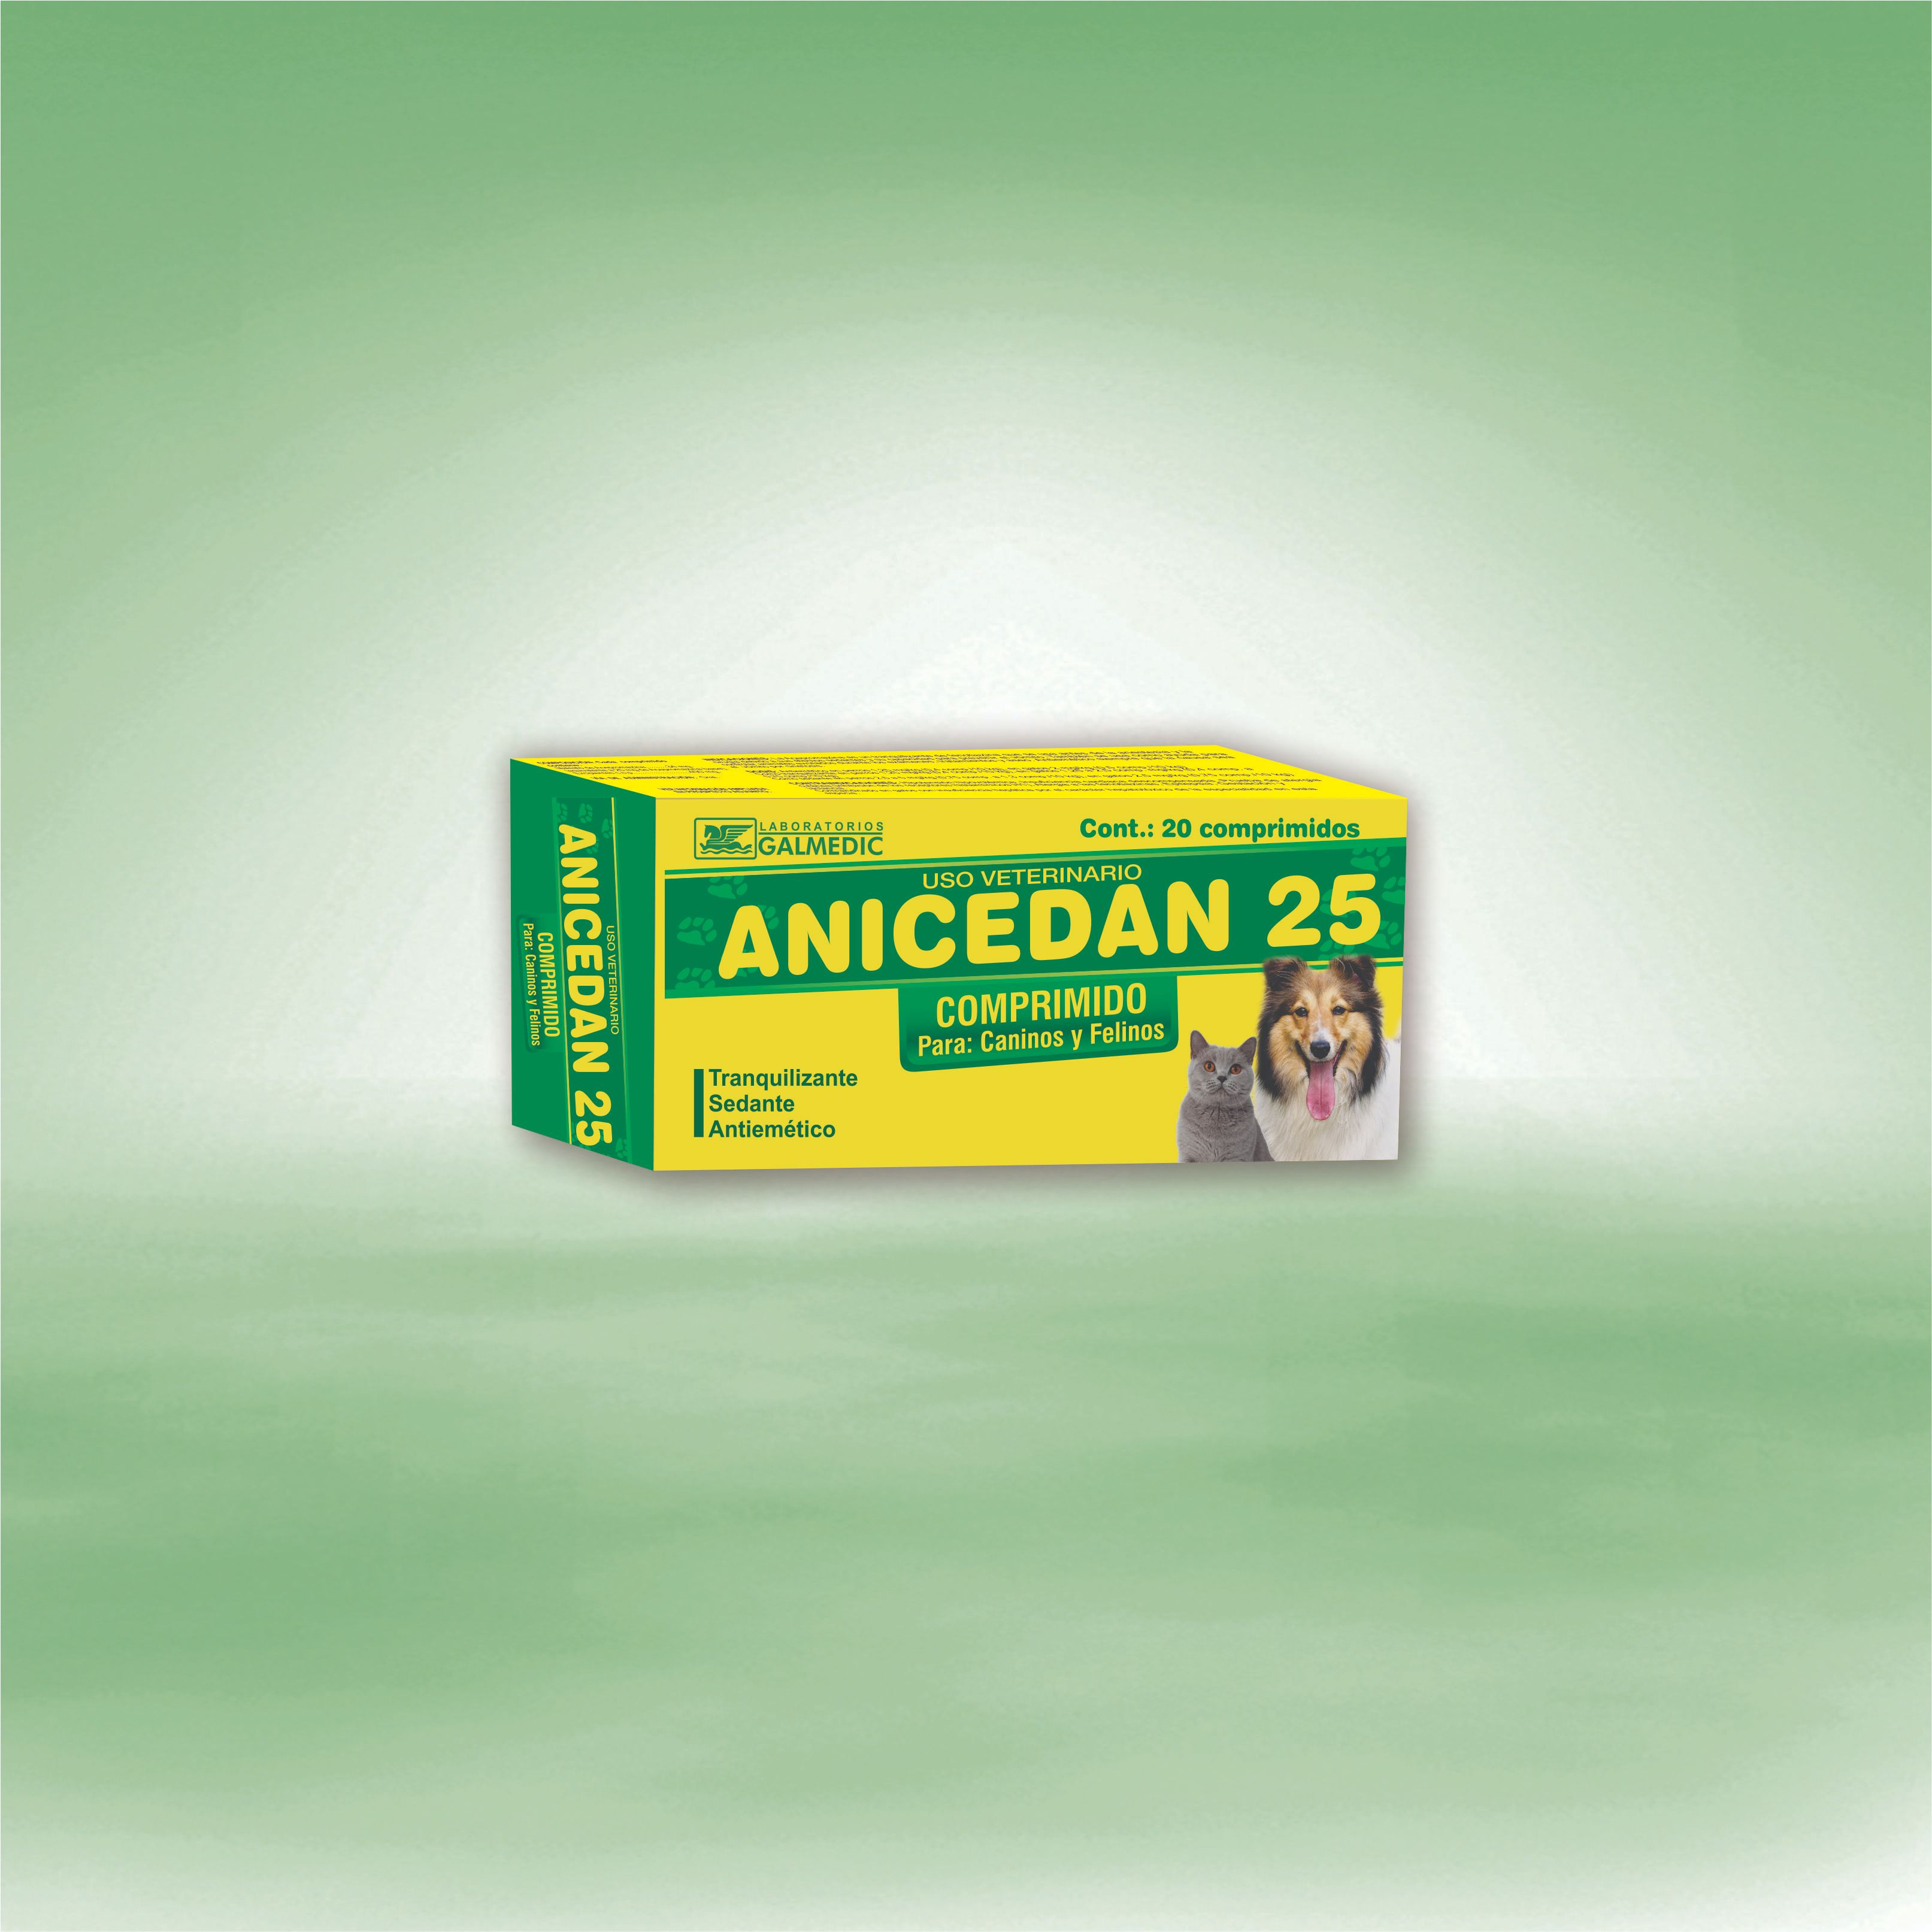 ANICEDAN 25